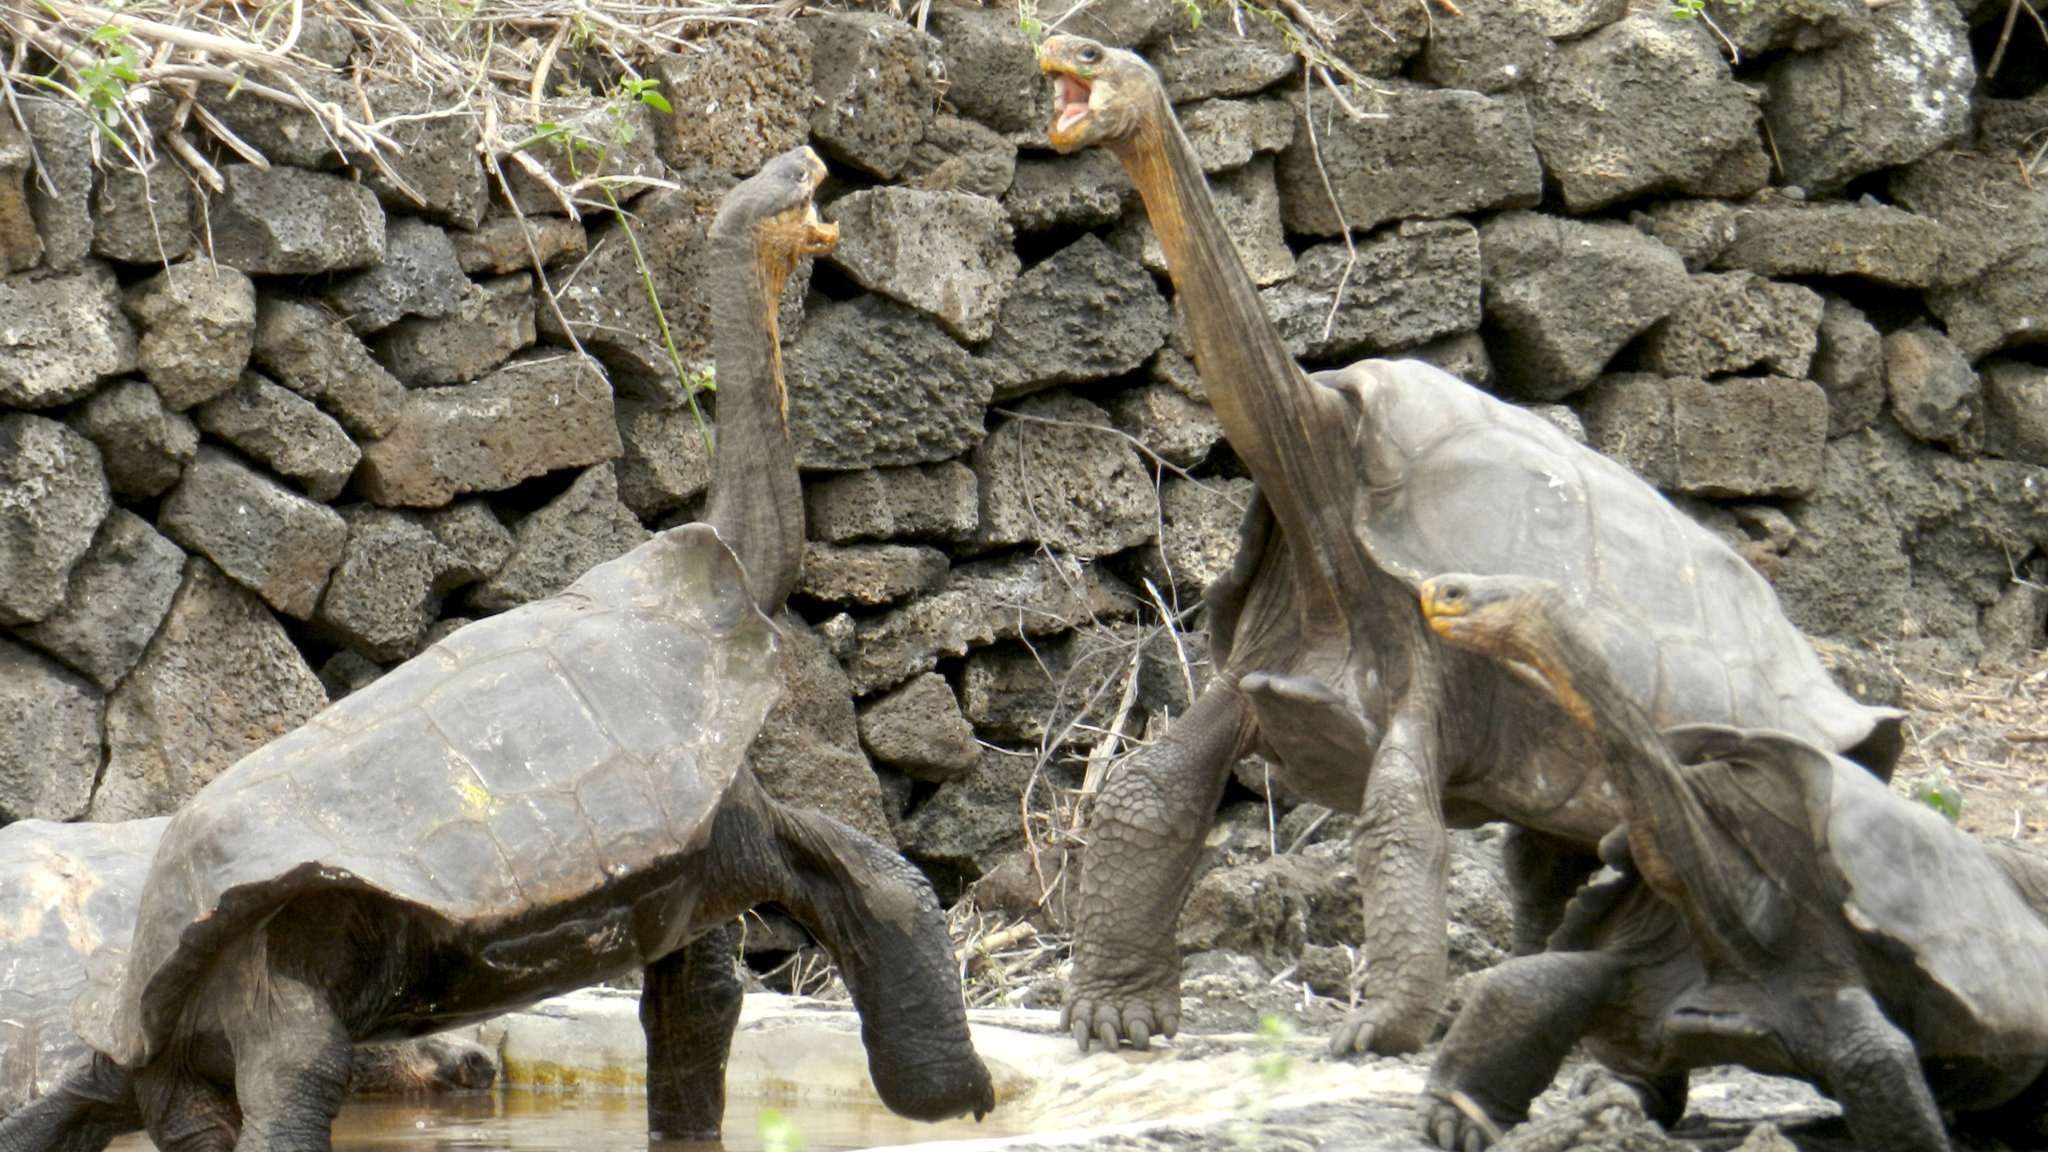 High Resolution Wallpaper | Galápagos Tortoise 2048x1152 px